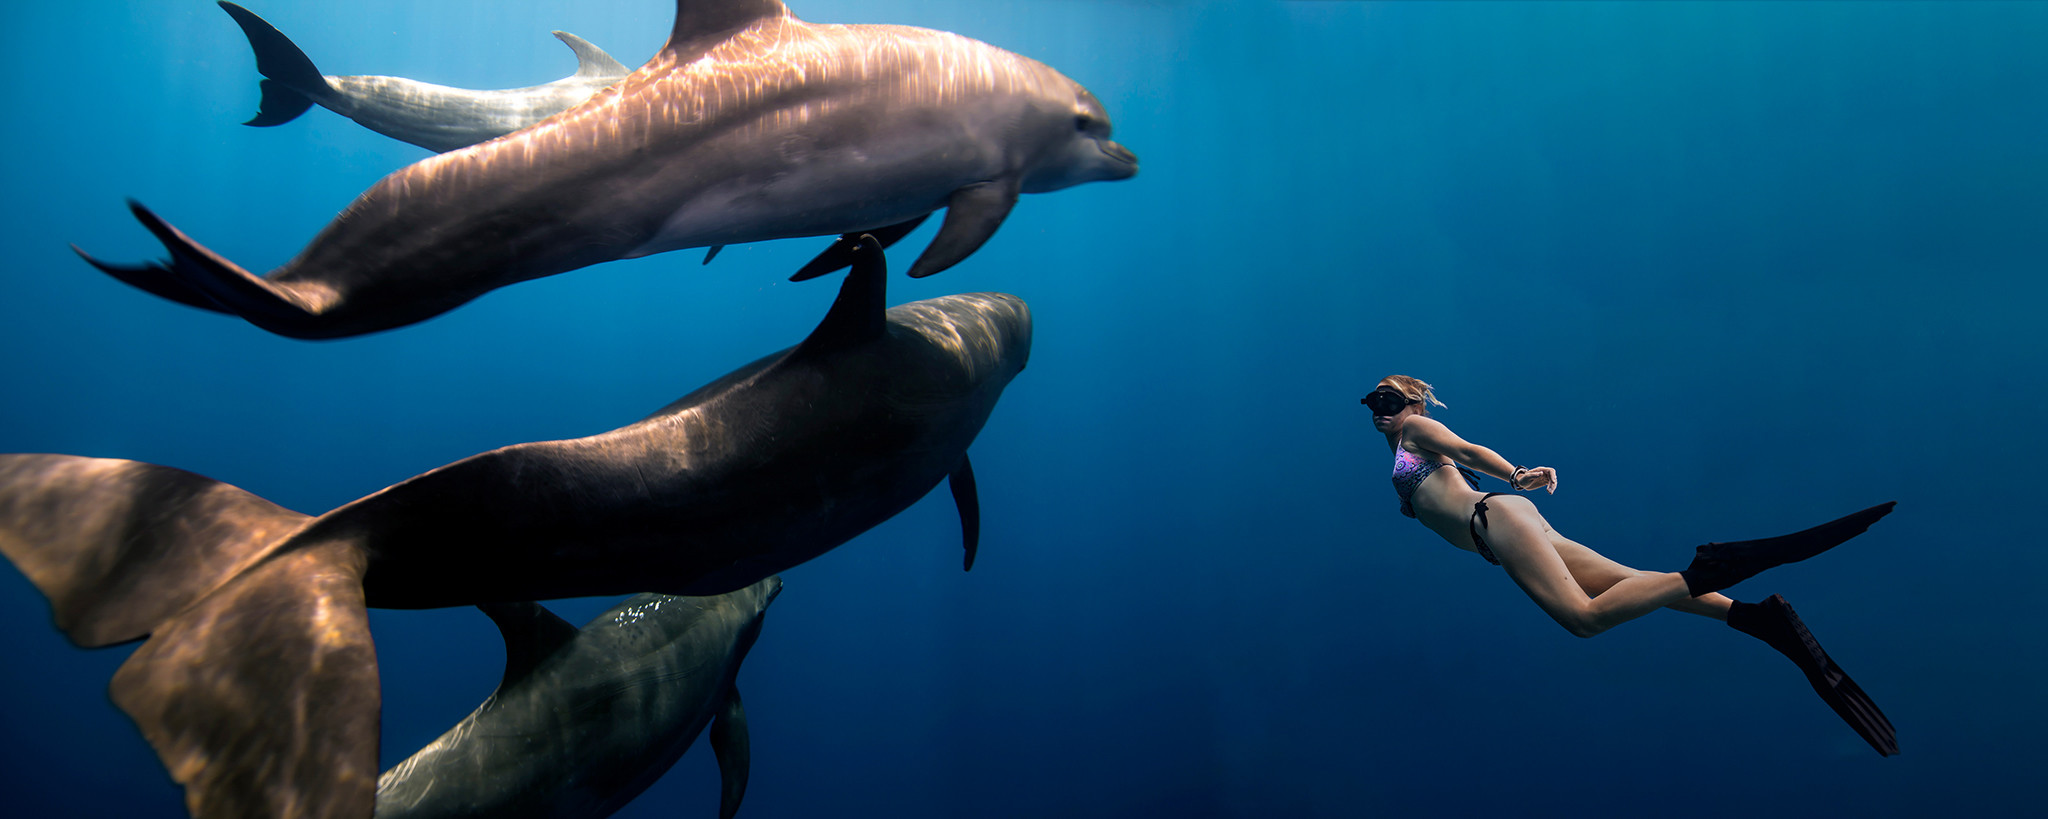 Delfinesokmore.jpg